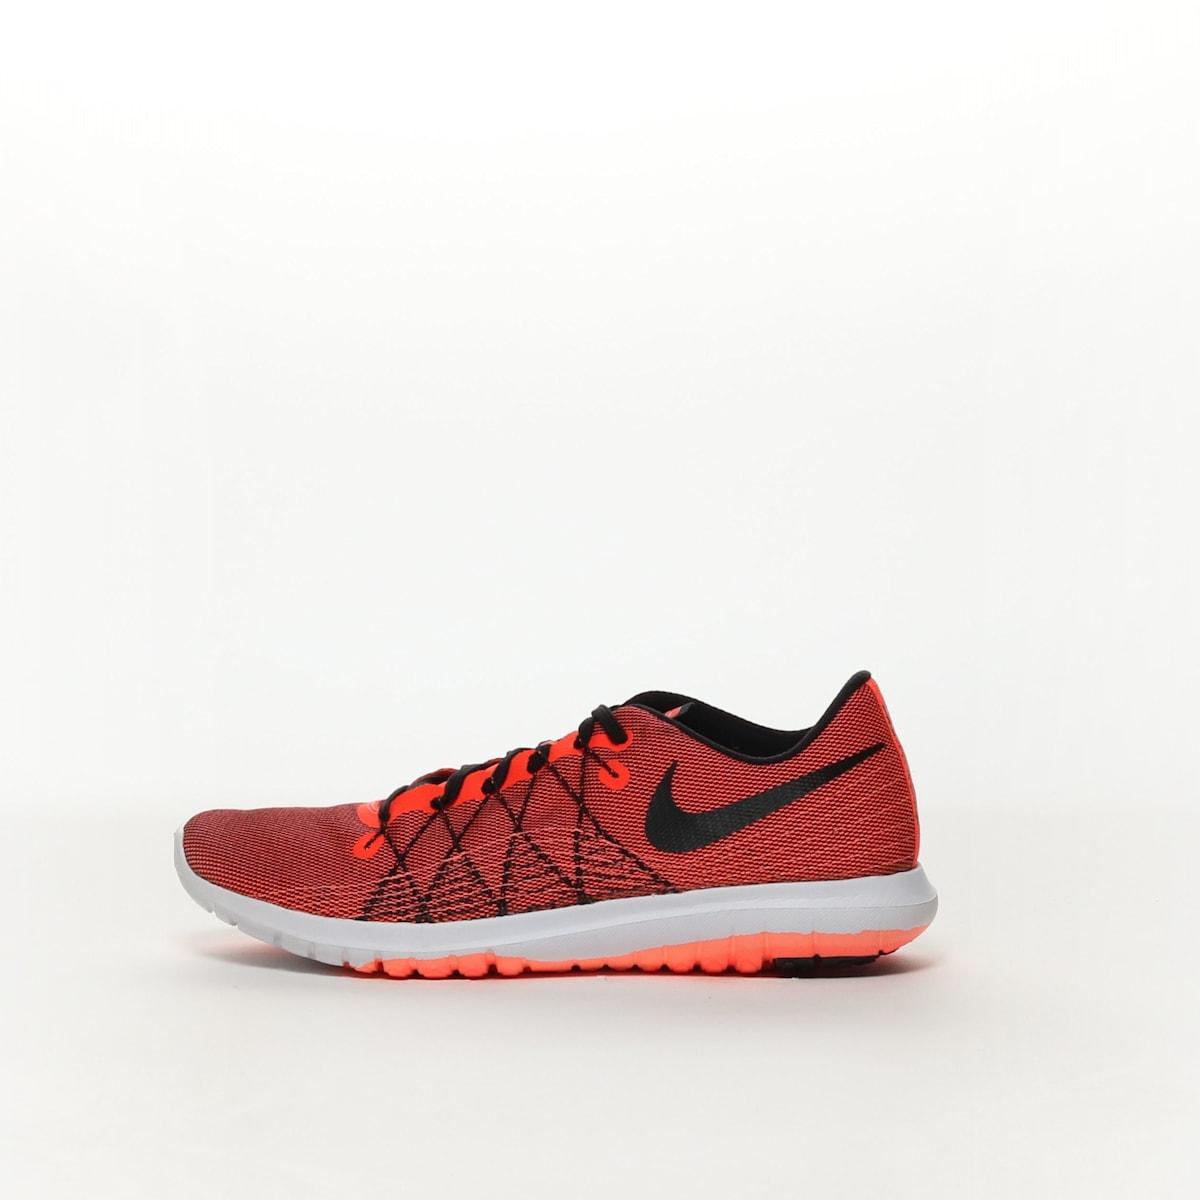 8b237c27f410 Men s Nike Flex Fury 2 Running Shoe - TOTAL CRIMSON BLACK-BLACK ...